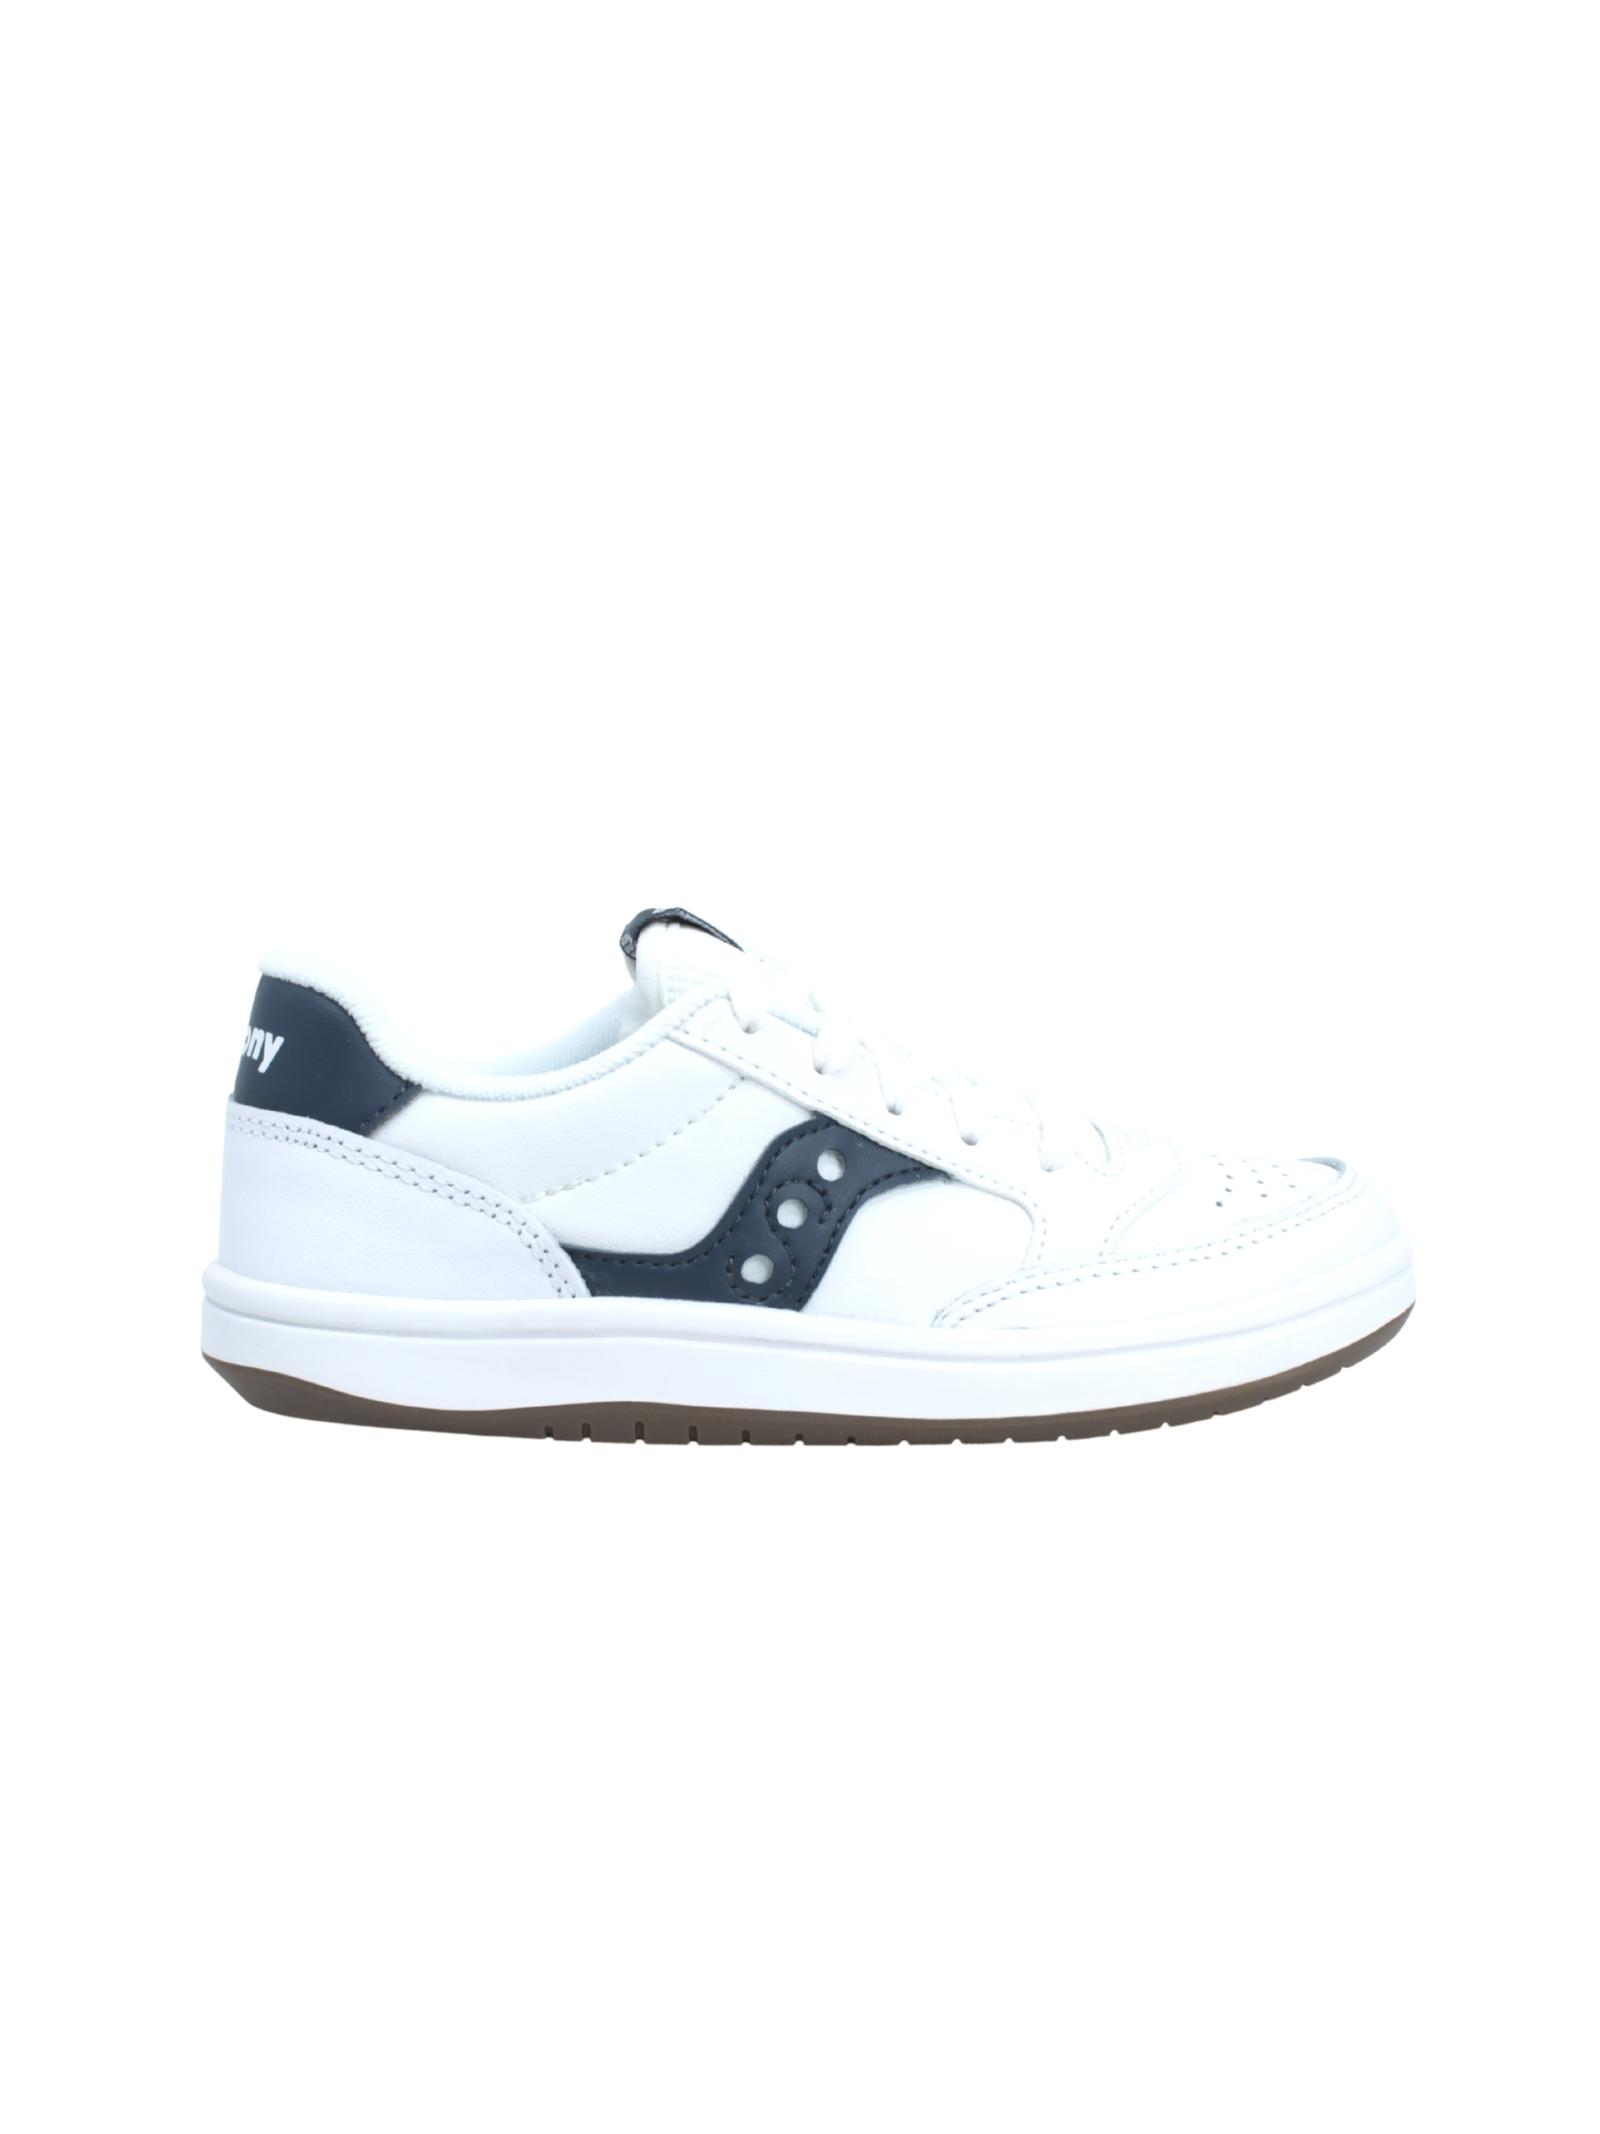 Sneakers Bambino Jazz Court Boy SAUCONY KIDS | Sneakers | SK264397WHITE/NAVY